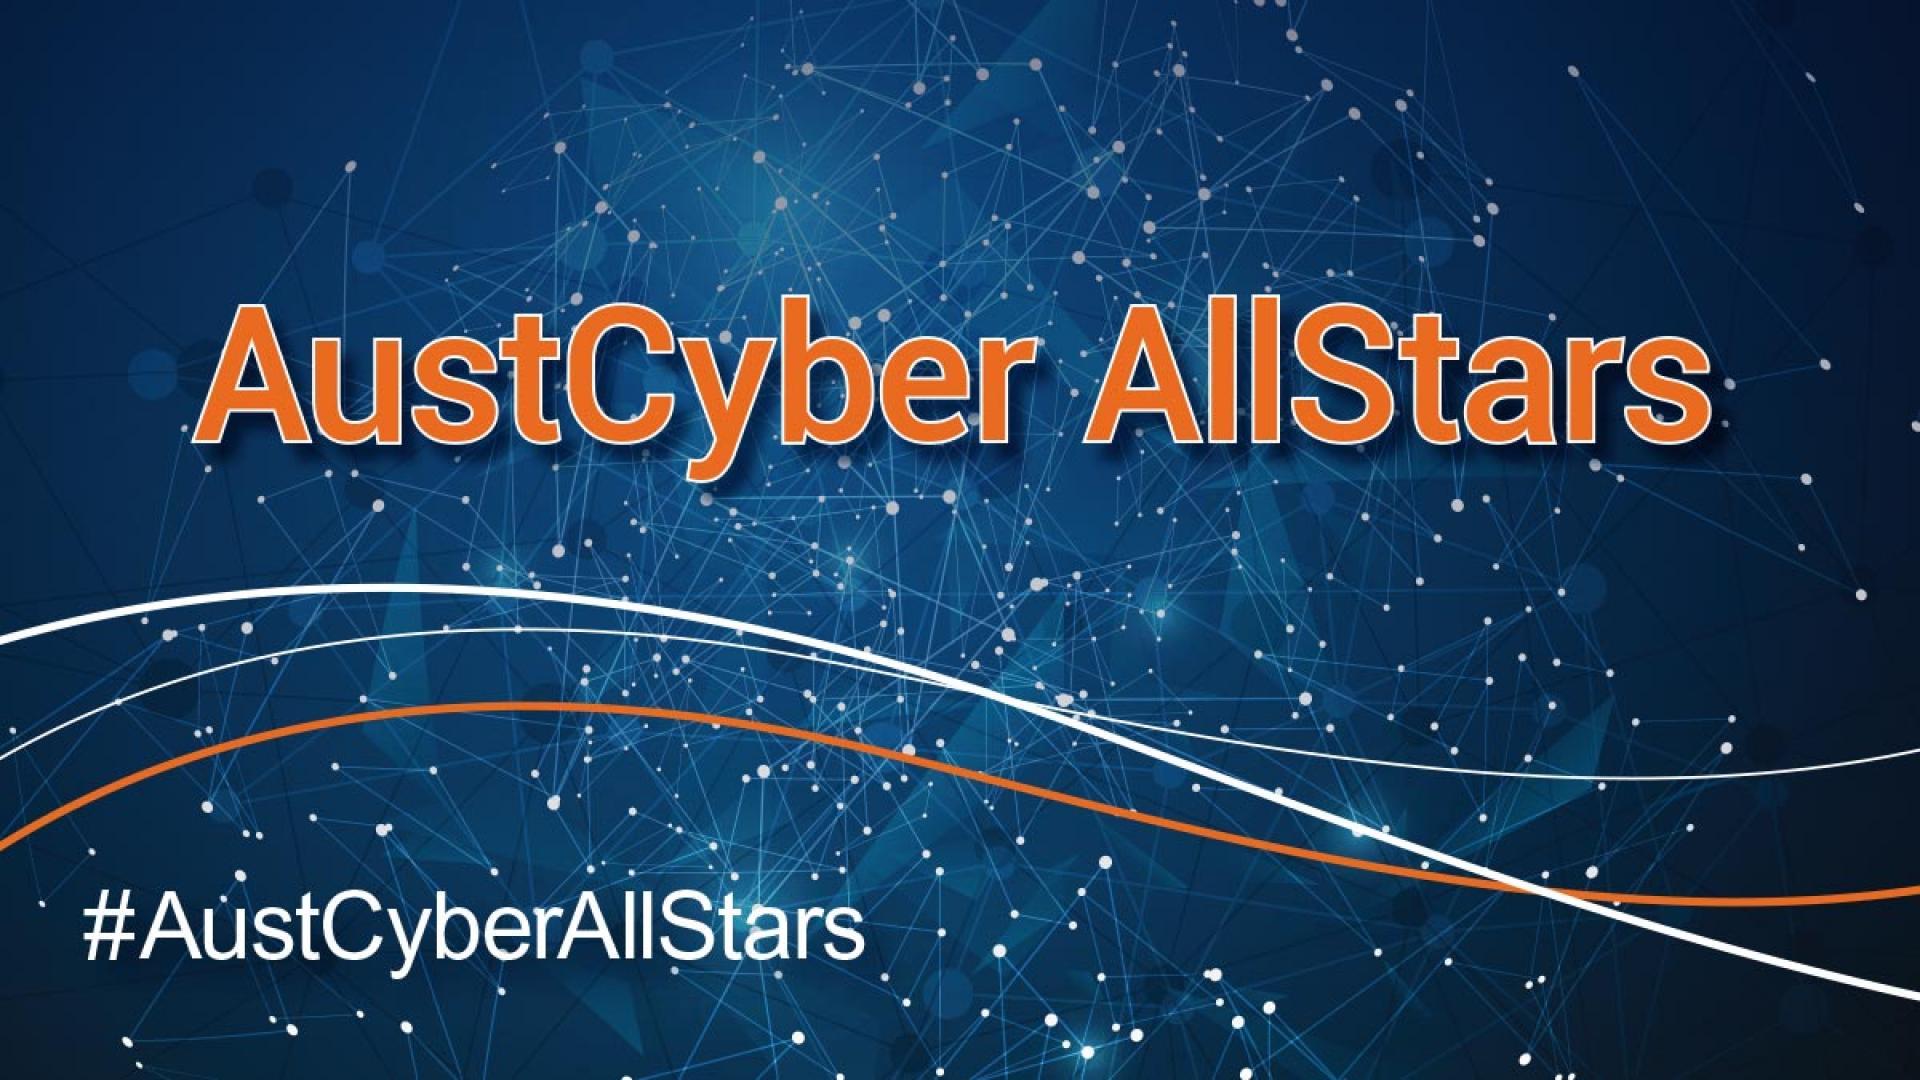 AustCyber Allstars